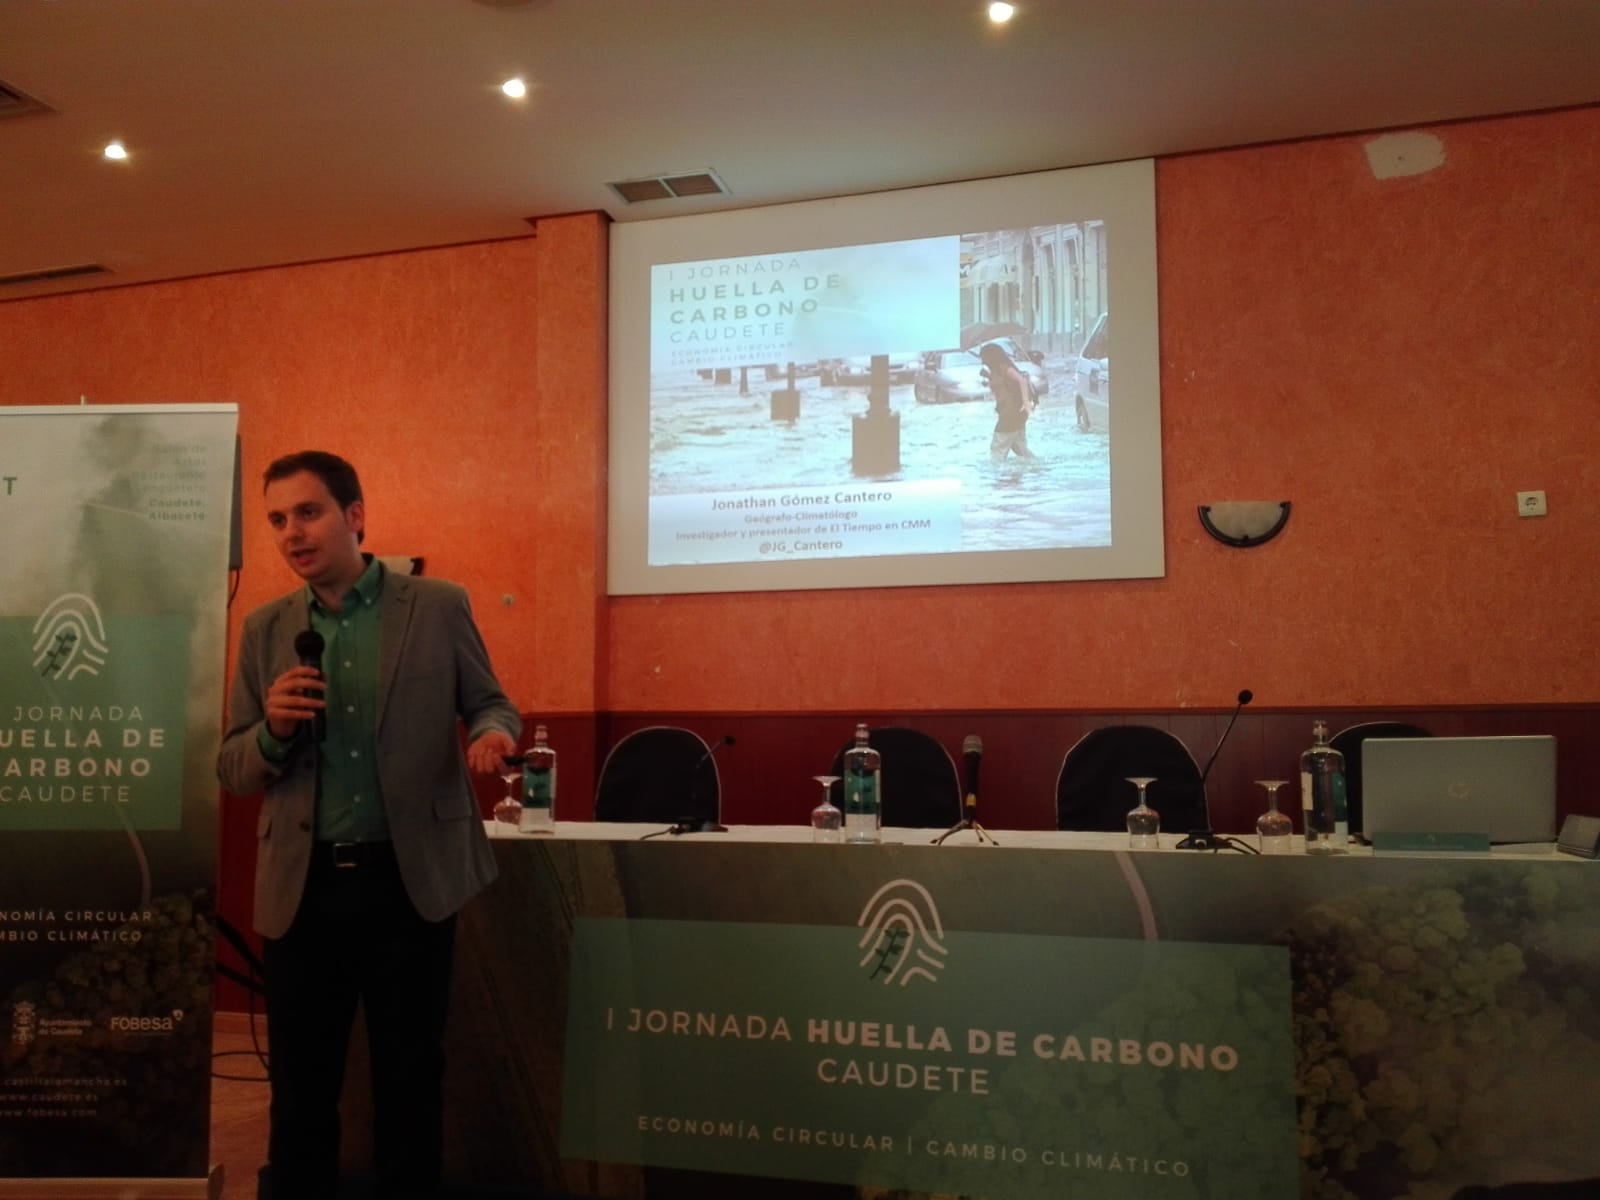 JONATHAN GOMEZ CANTERO GEOGRAFO CLIMATOL